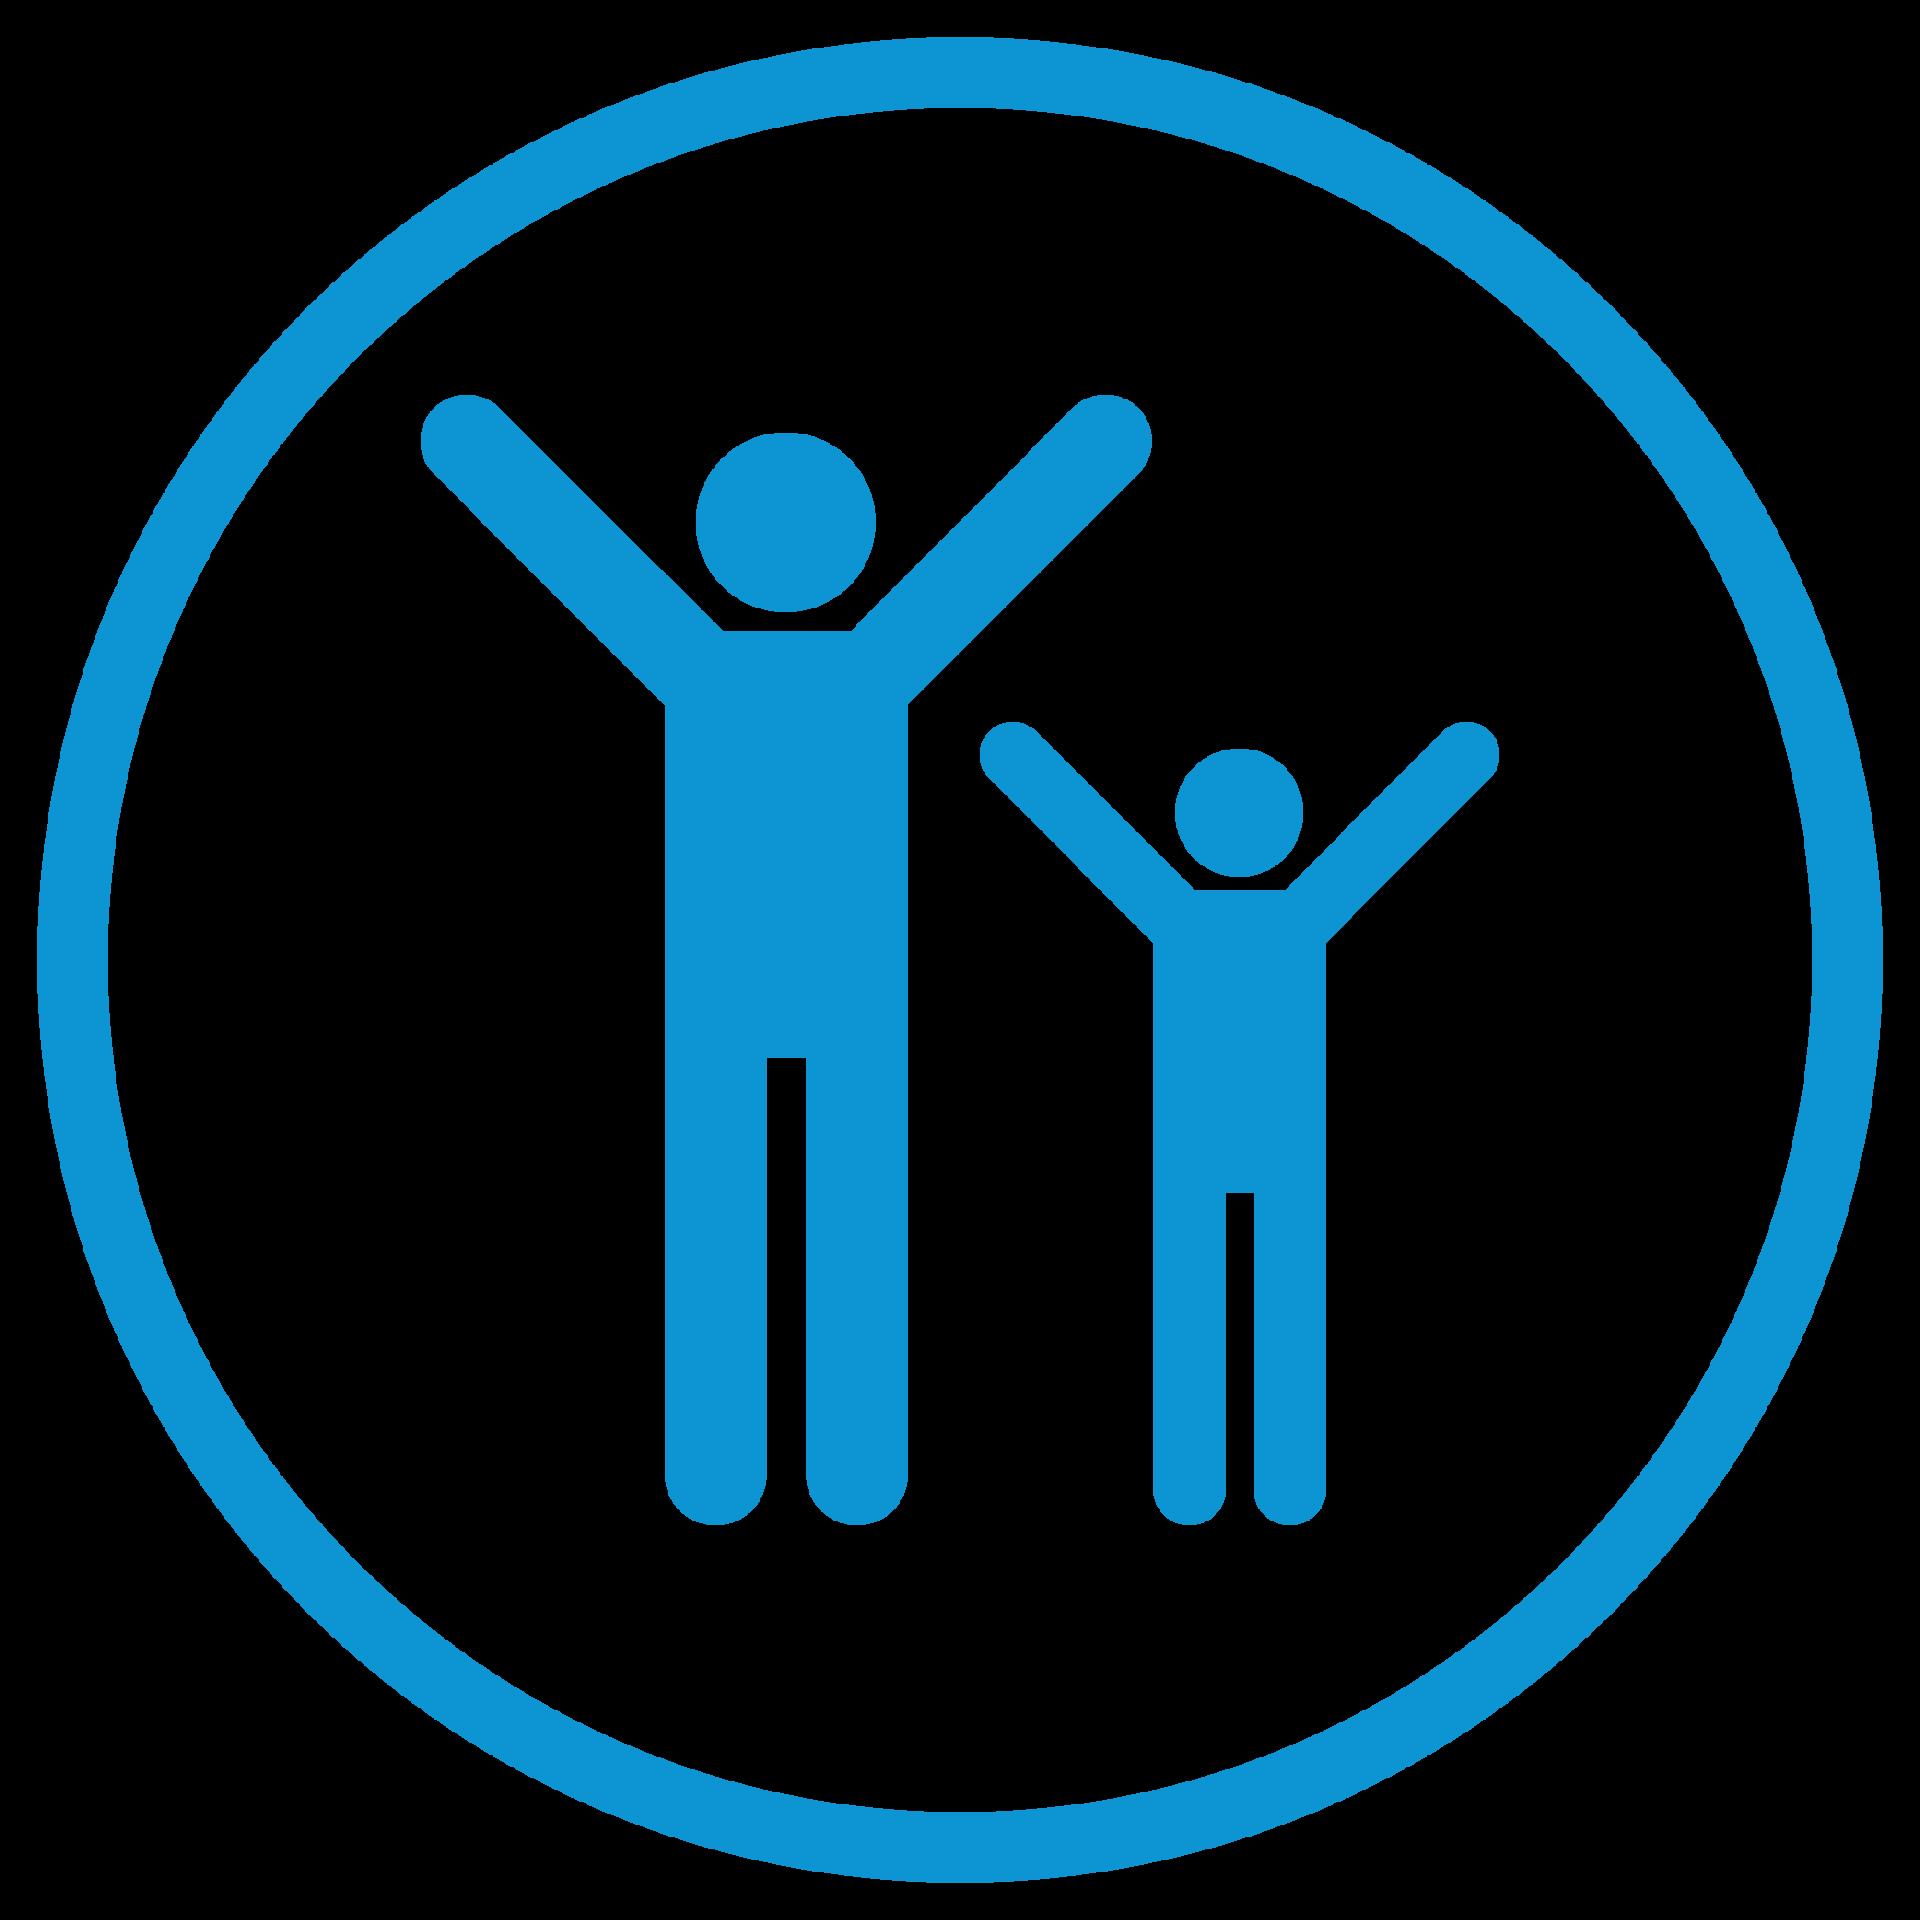 AmbulatoryIcon_Consumers_blue_parent and child